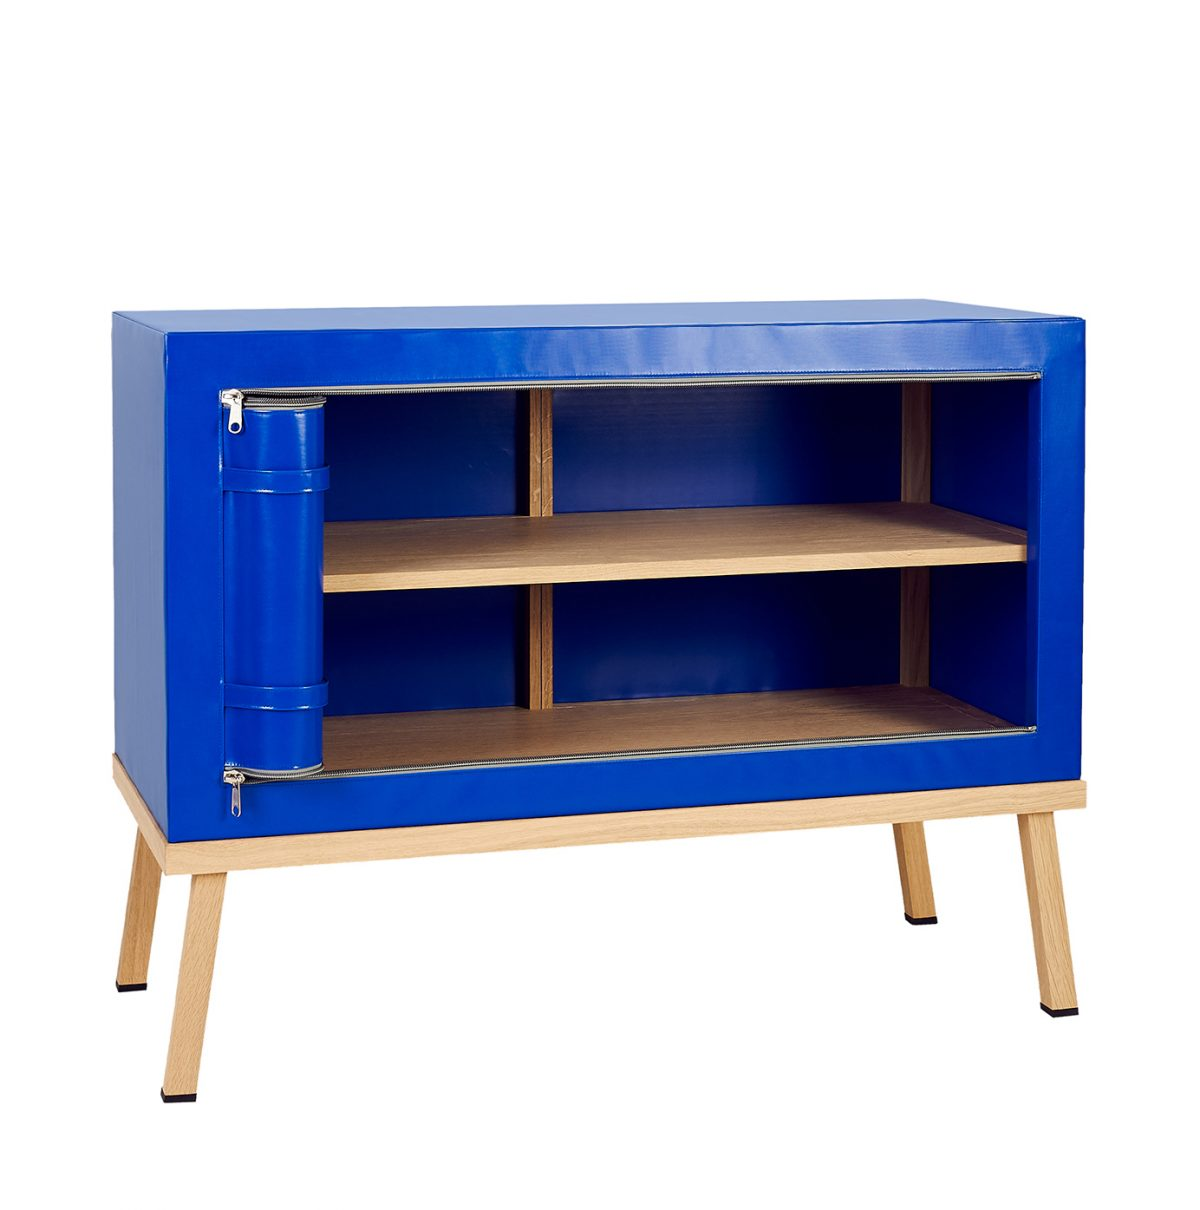 Visser&Meijwaard Truecolors Credenza Dresser Blue Kast